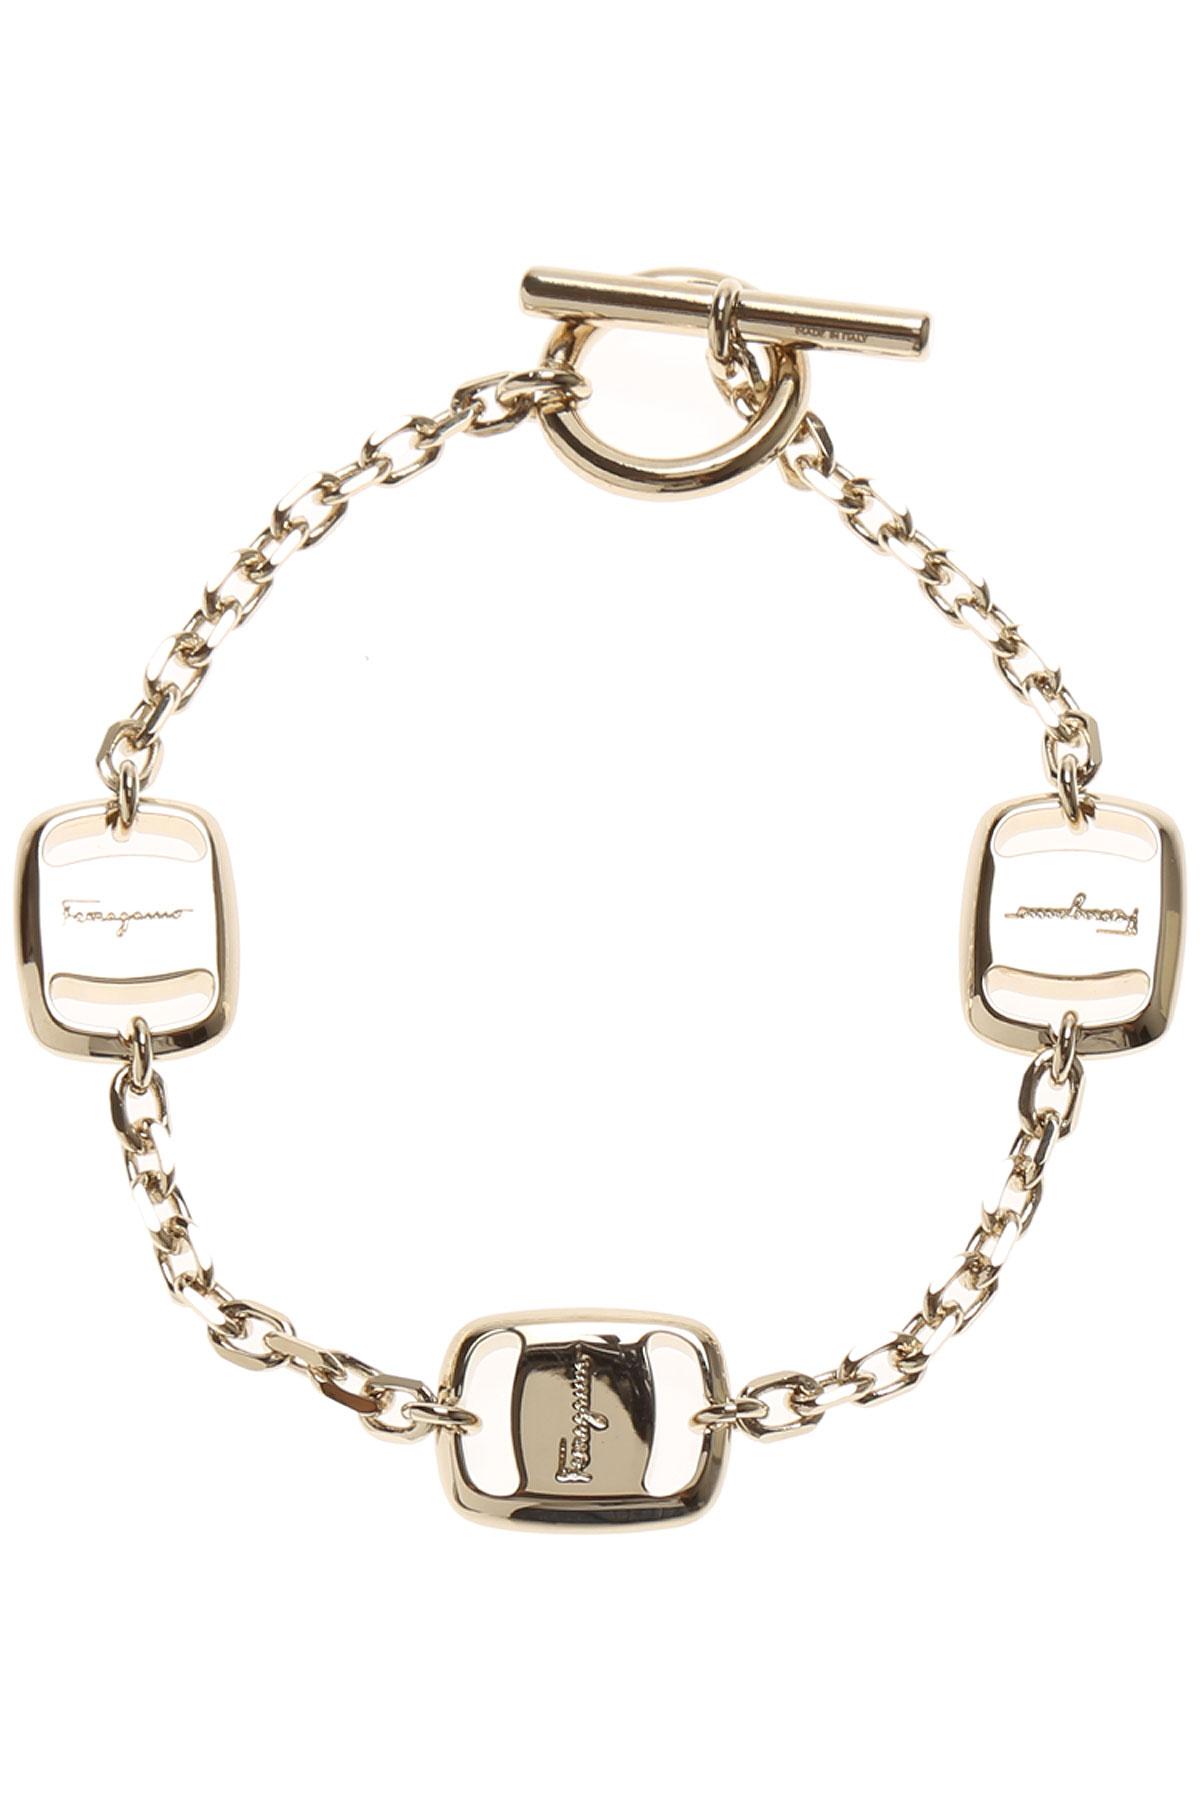 Image of Salvatore Ferragamo Bracelet for Women, Gold, Brass, 2017